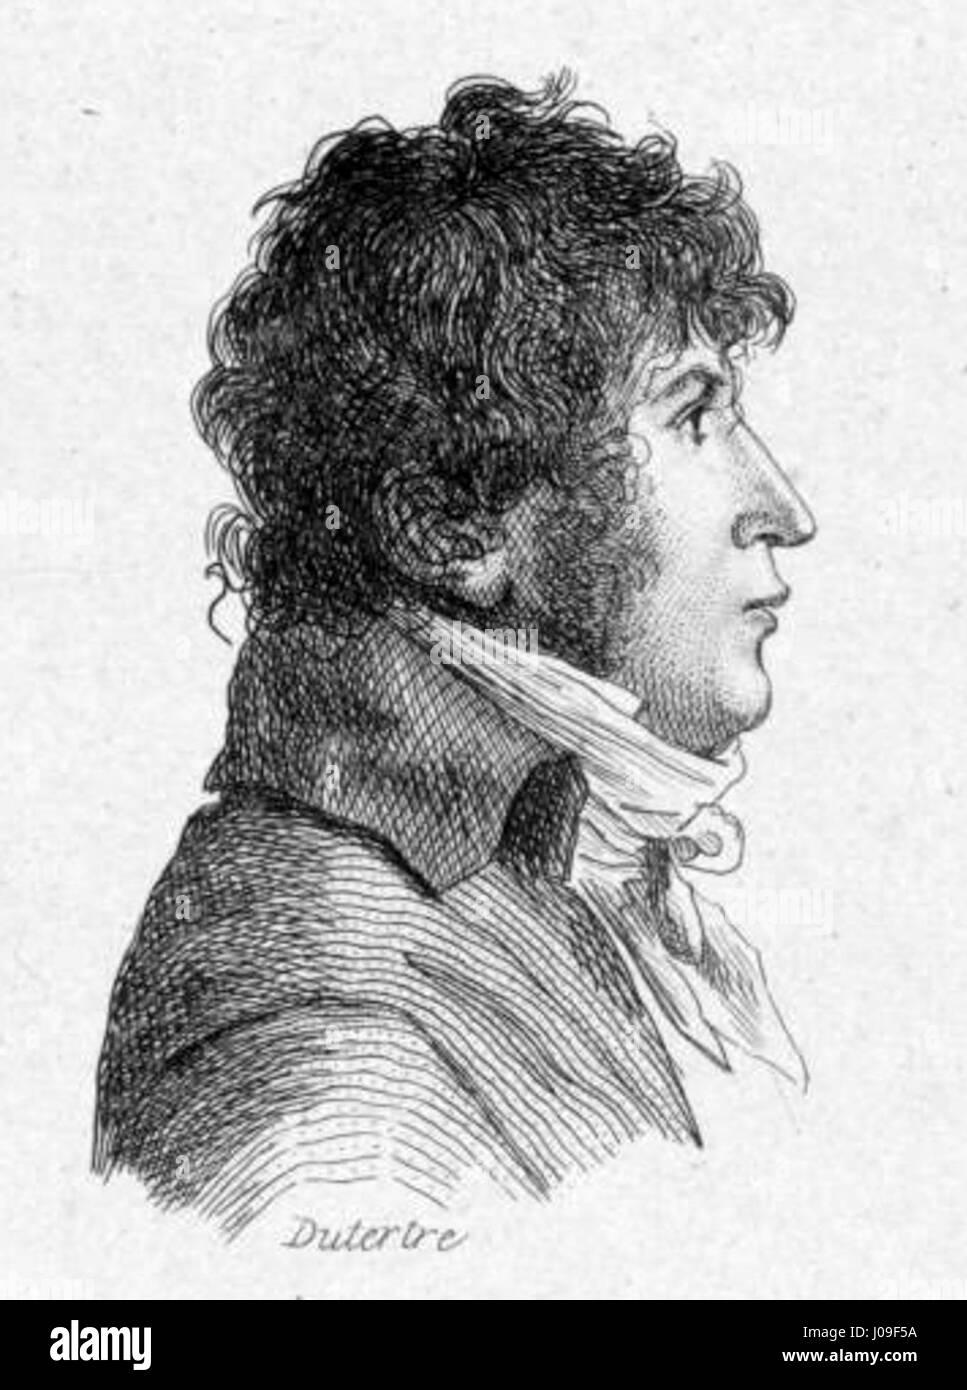 Henri-Joseph Rigel by André Dutertre - Stock Image